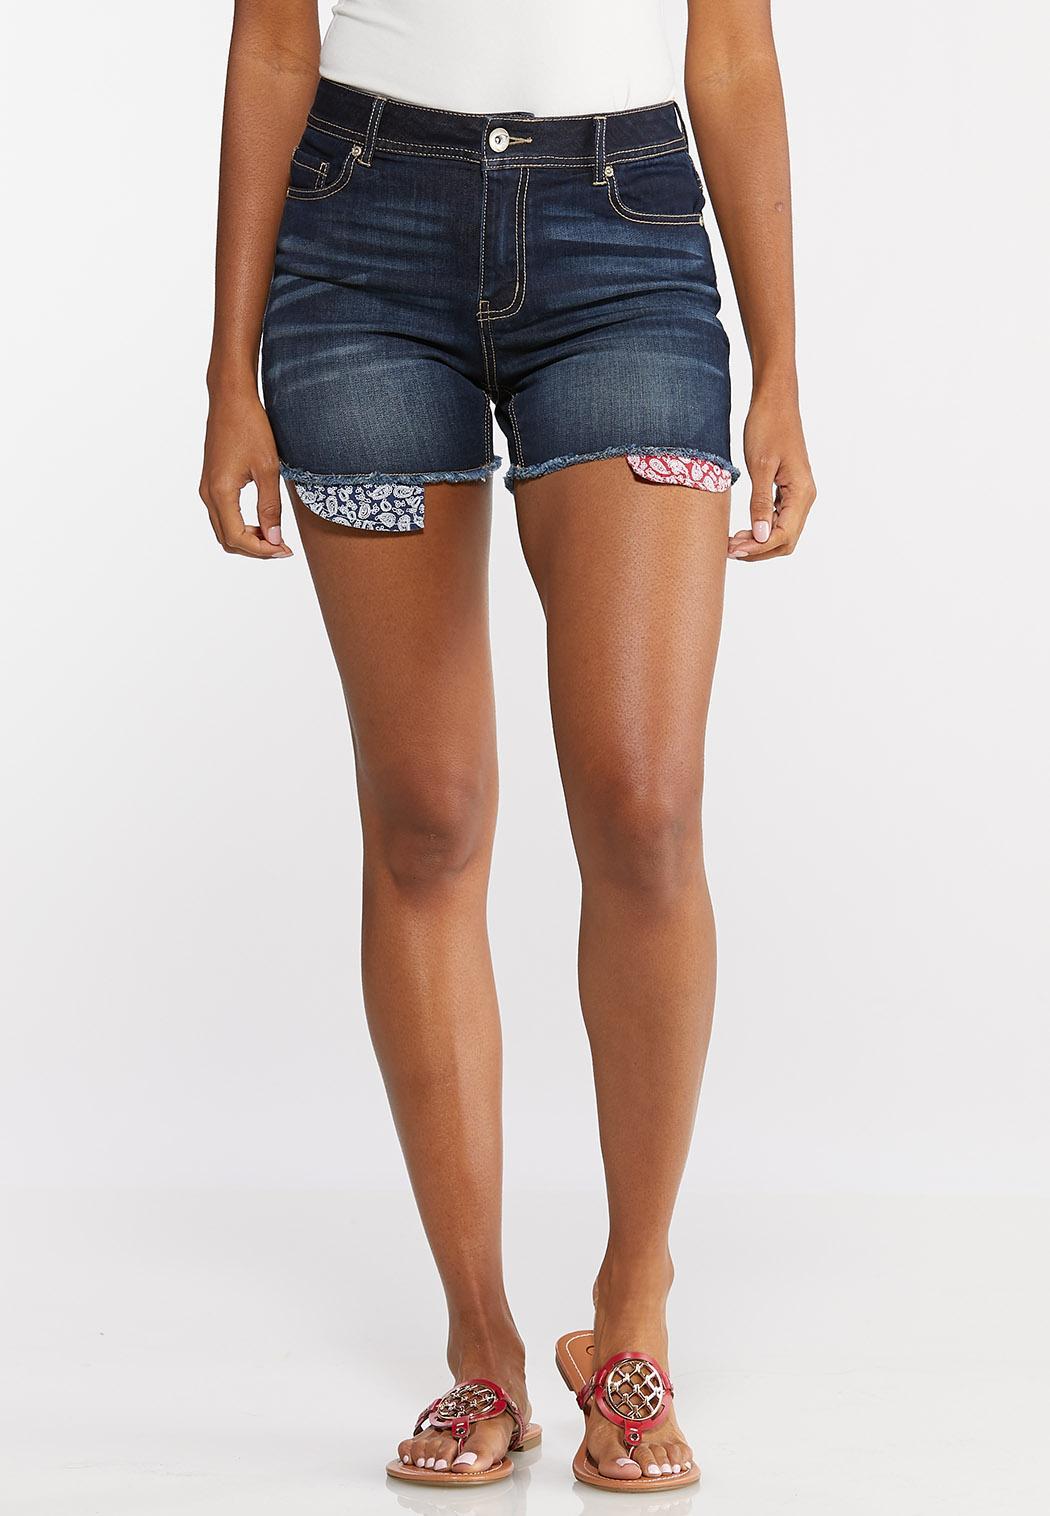 892469a7b0f Jeans For Women - Denim